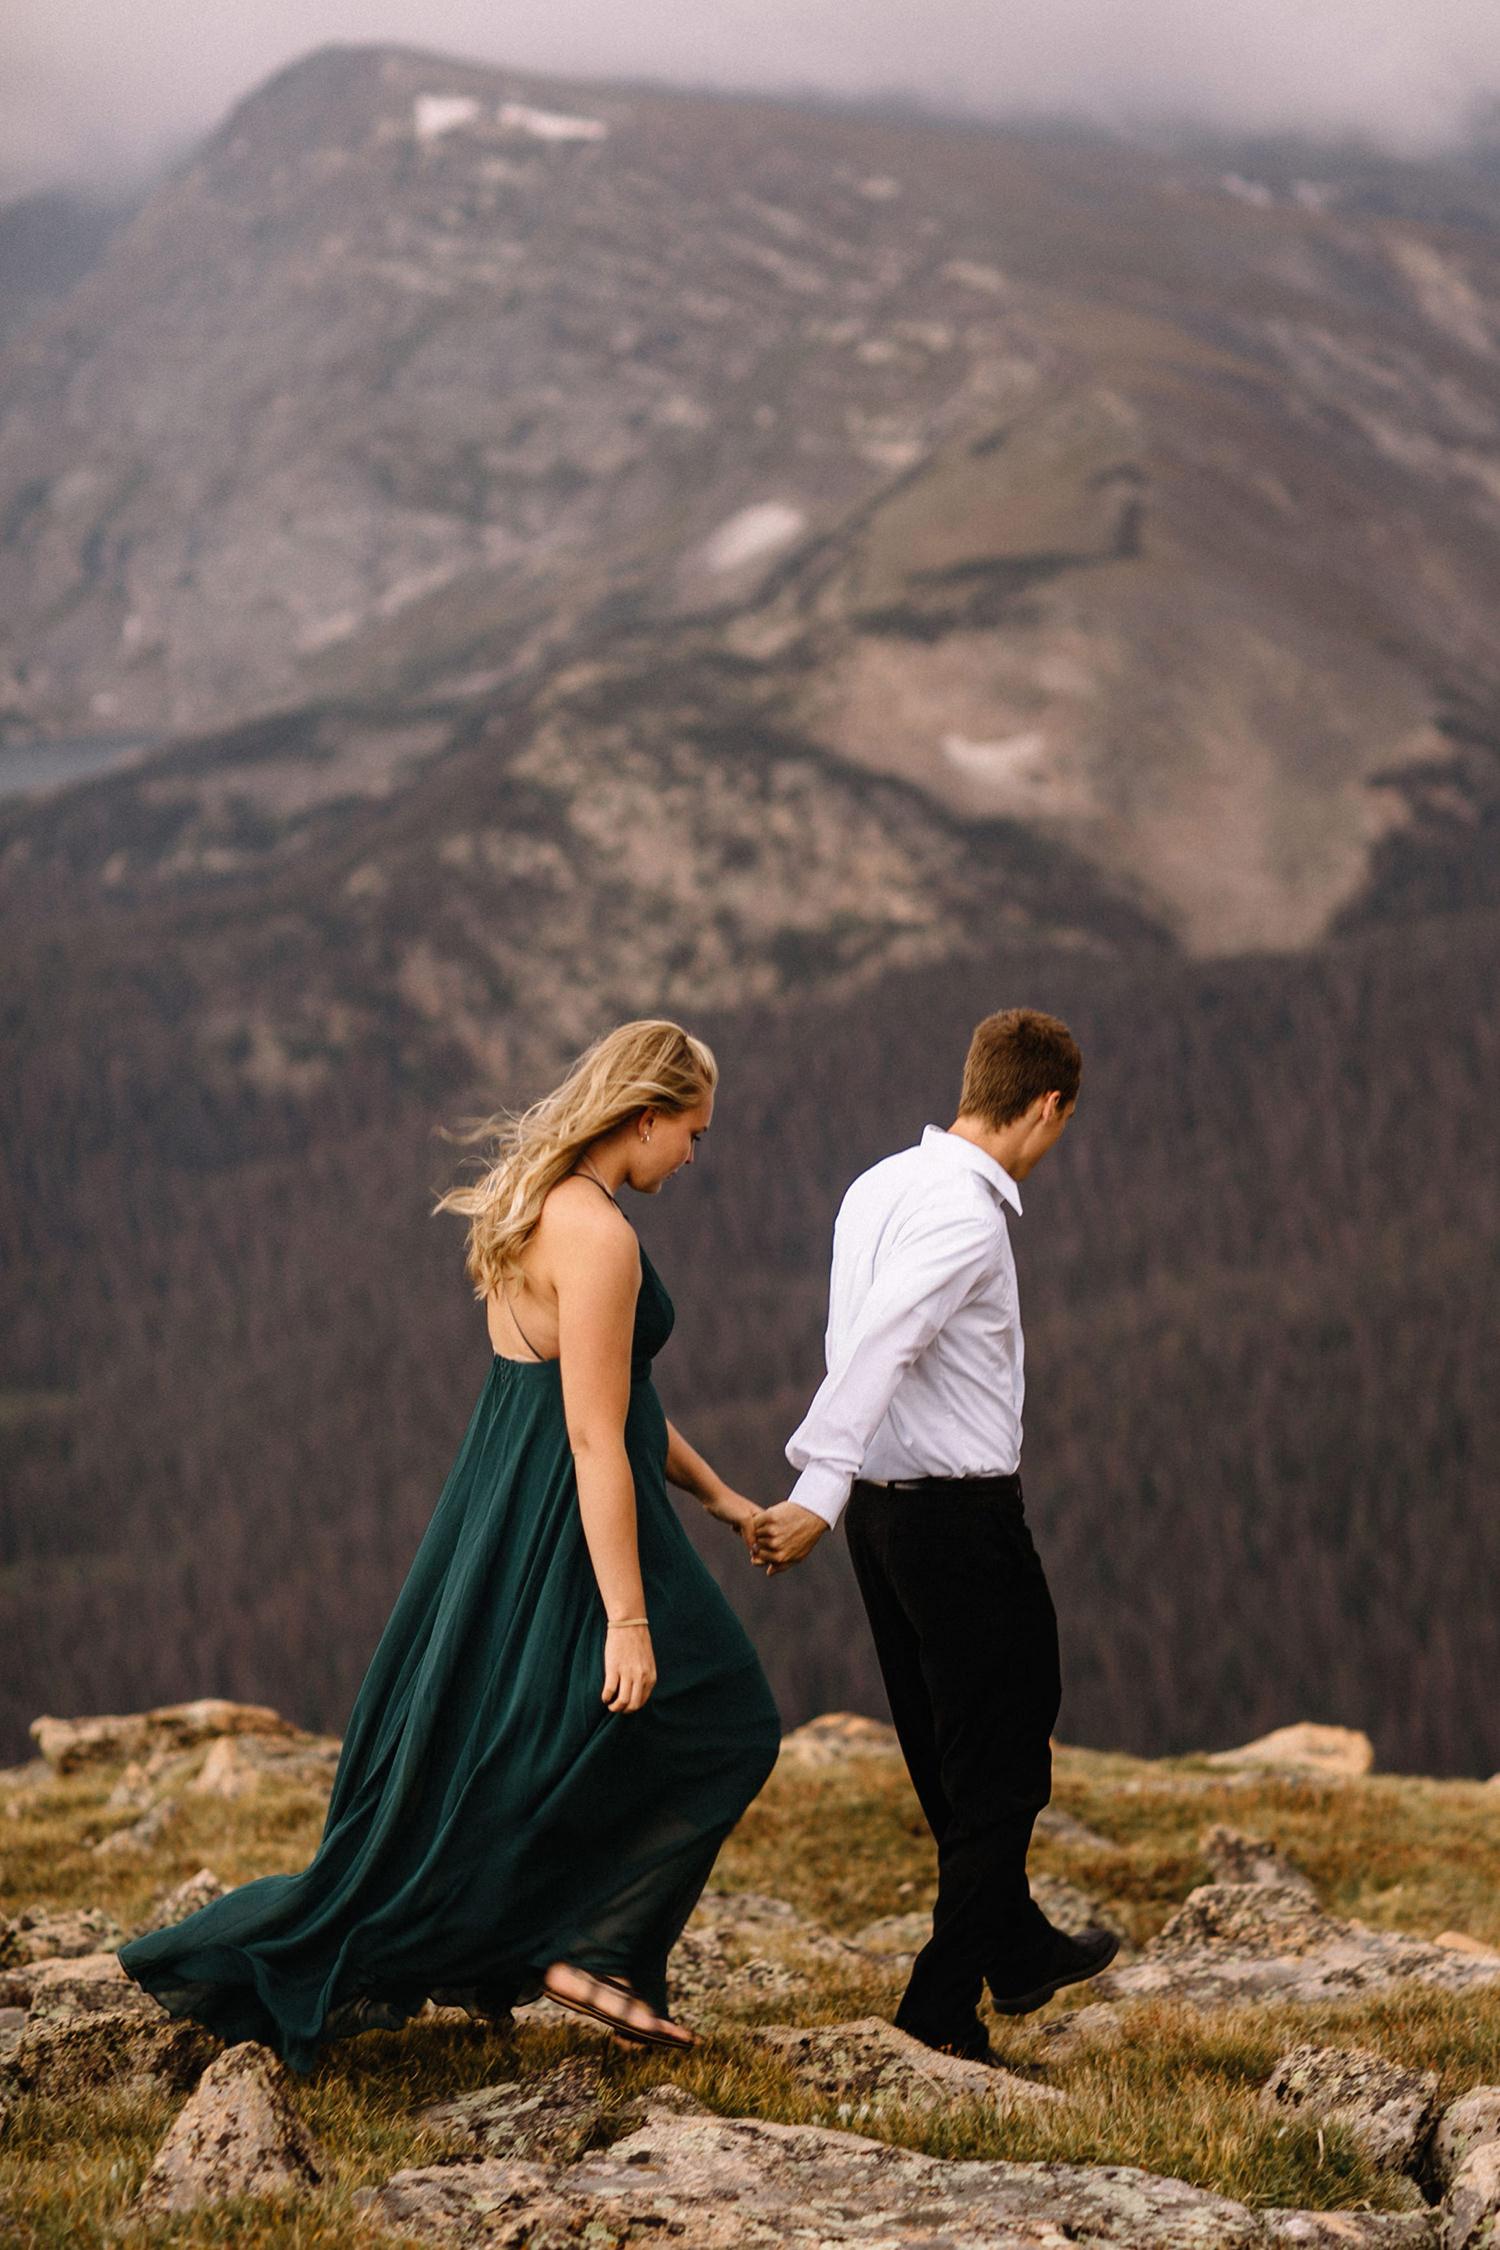 Rocky Mountain Engagement National Park Engaged Photos Wedding Elopement Portrait Mountains Trail Ridge Rd Peak Alpine Dress Lulus Rules Permit Photo Adventure Love Couples Destination Liz Osban photography Cheyenne Wyoming16.jpg